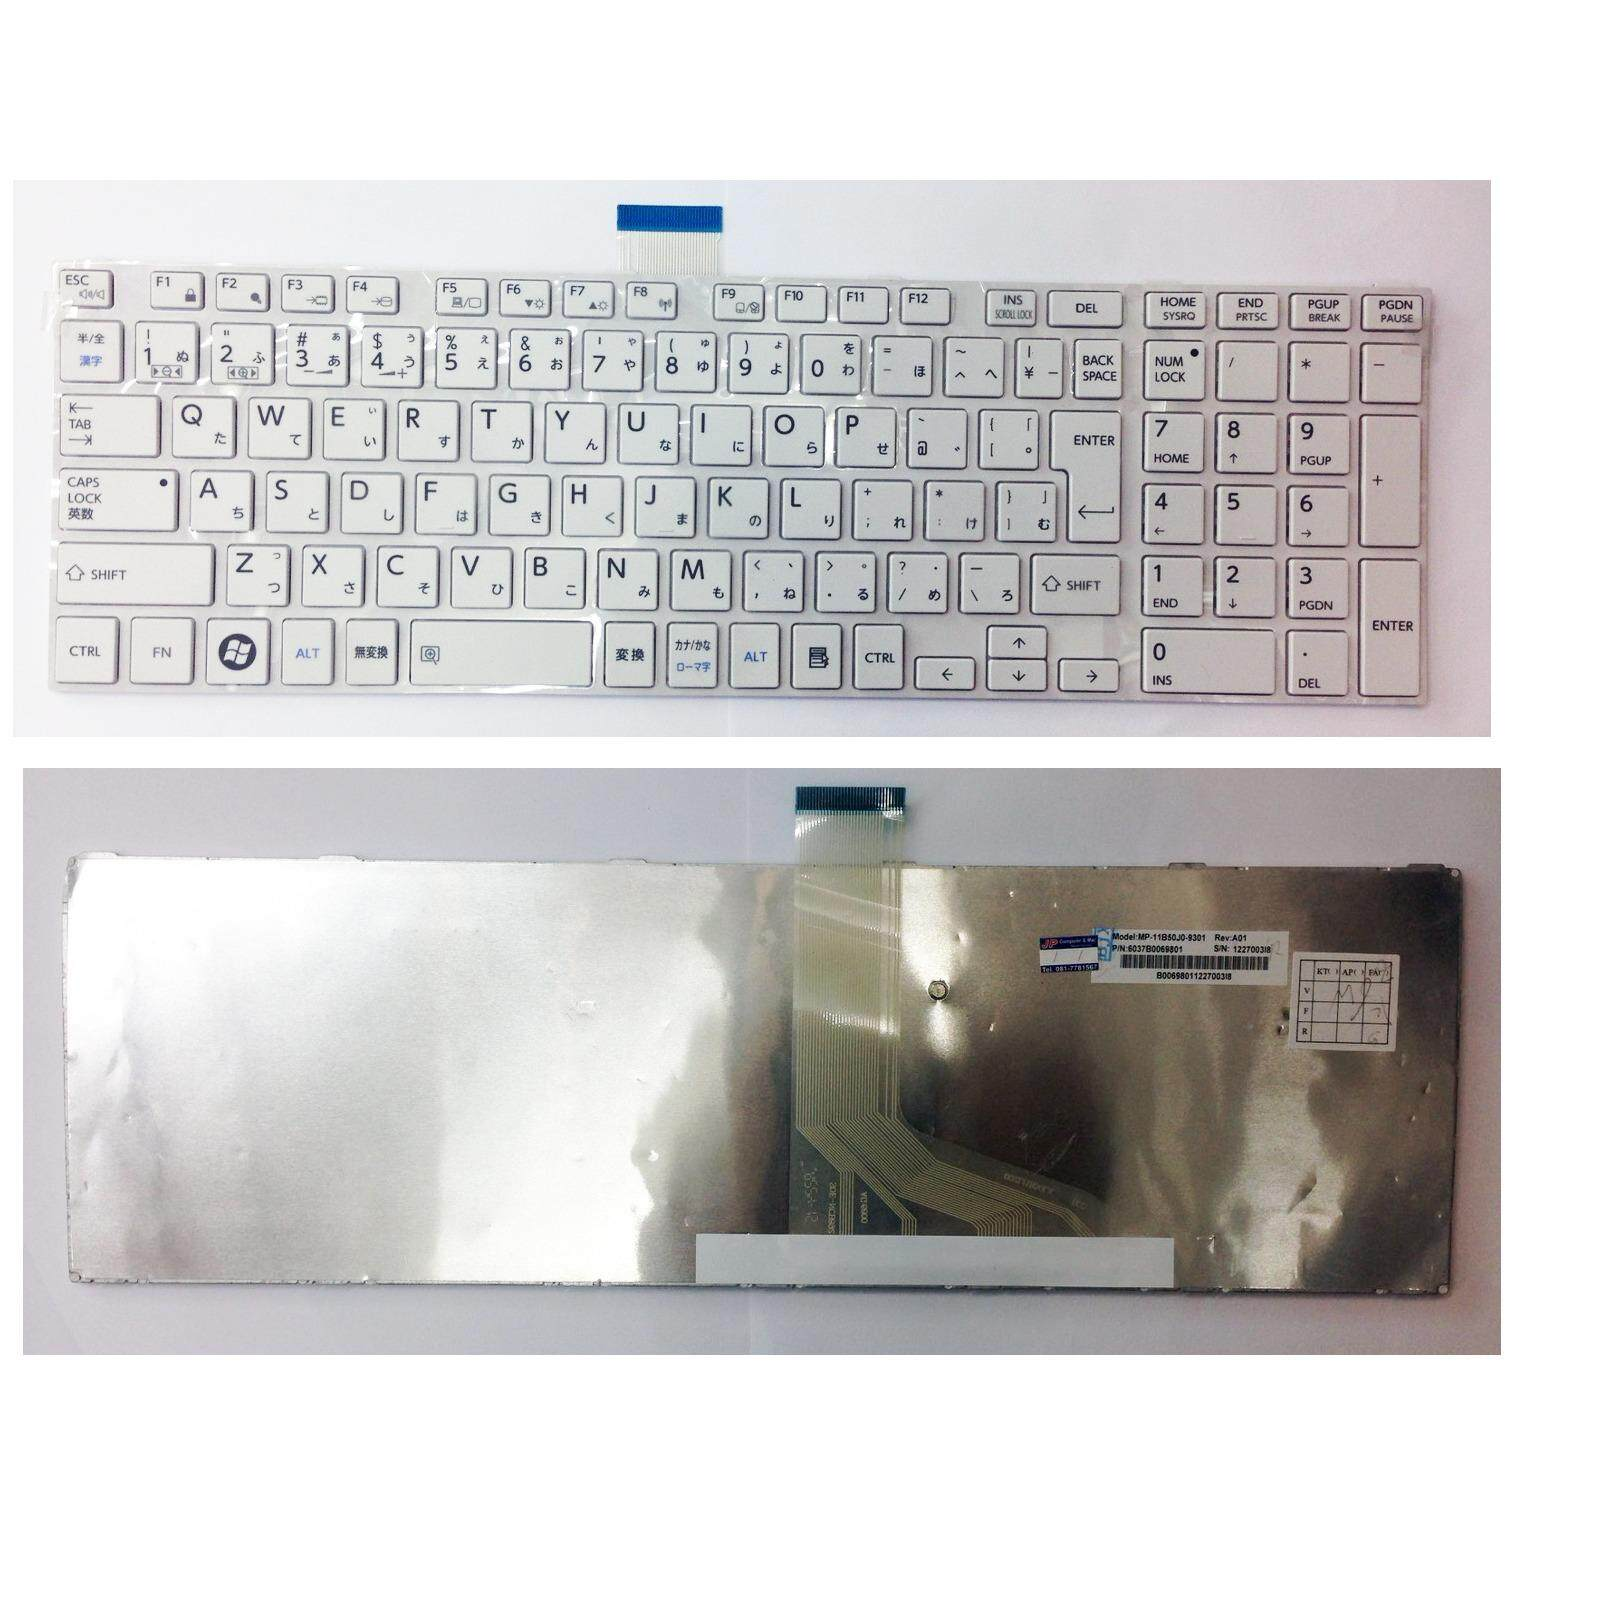 Toshiba Baterai Notebook Satellite M338 Hitam Daftar Harga Keyboard L510 M500 M501 M502 M503 M505 M506 T210 Series Source Other C850